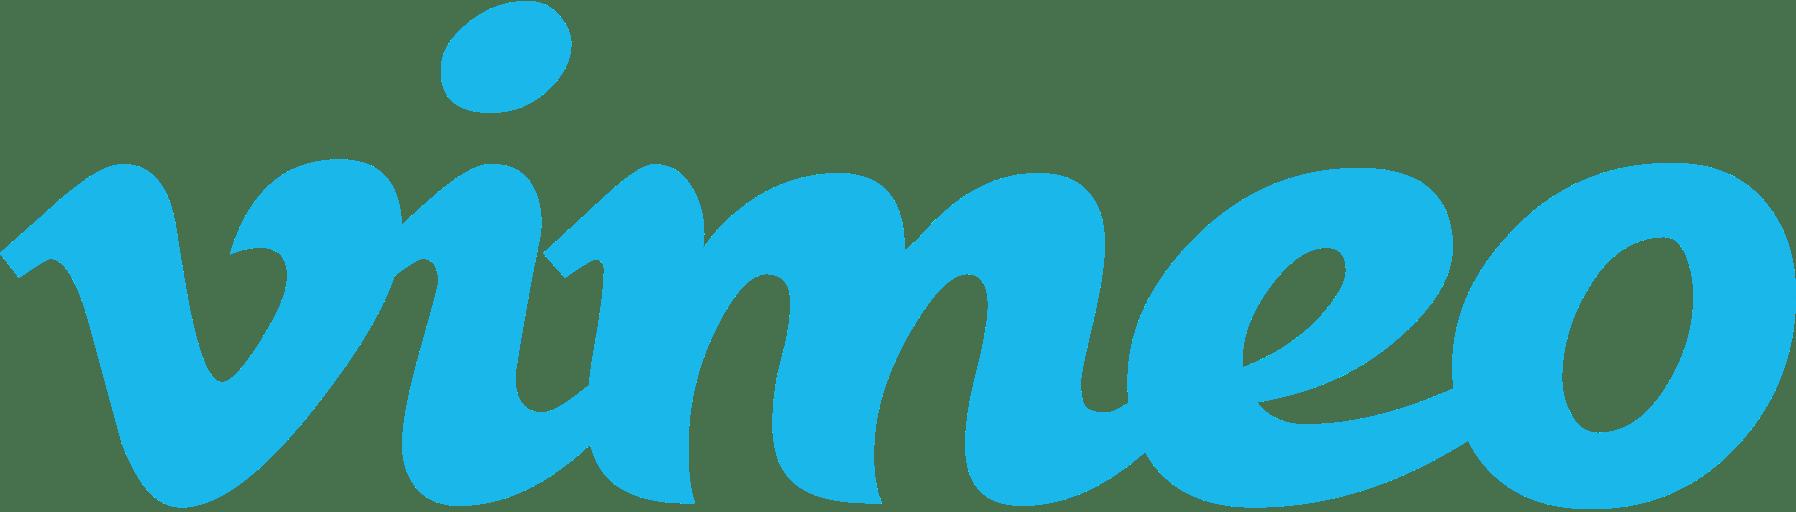 Vimeo logo clipart transparent background clip art free download Vimeo Logo transparent PNG - StickPNG clip art free download